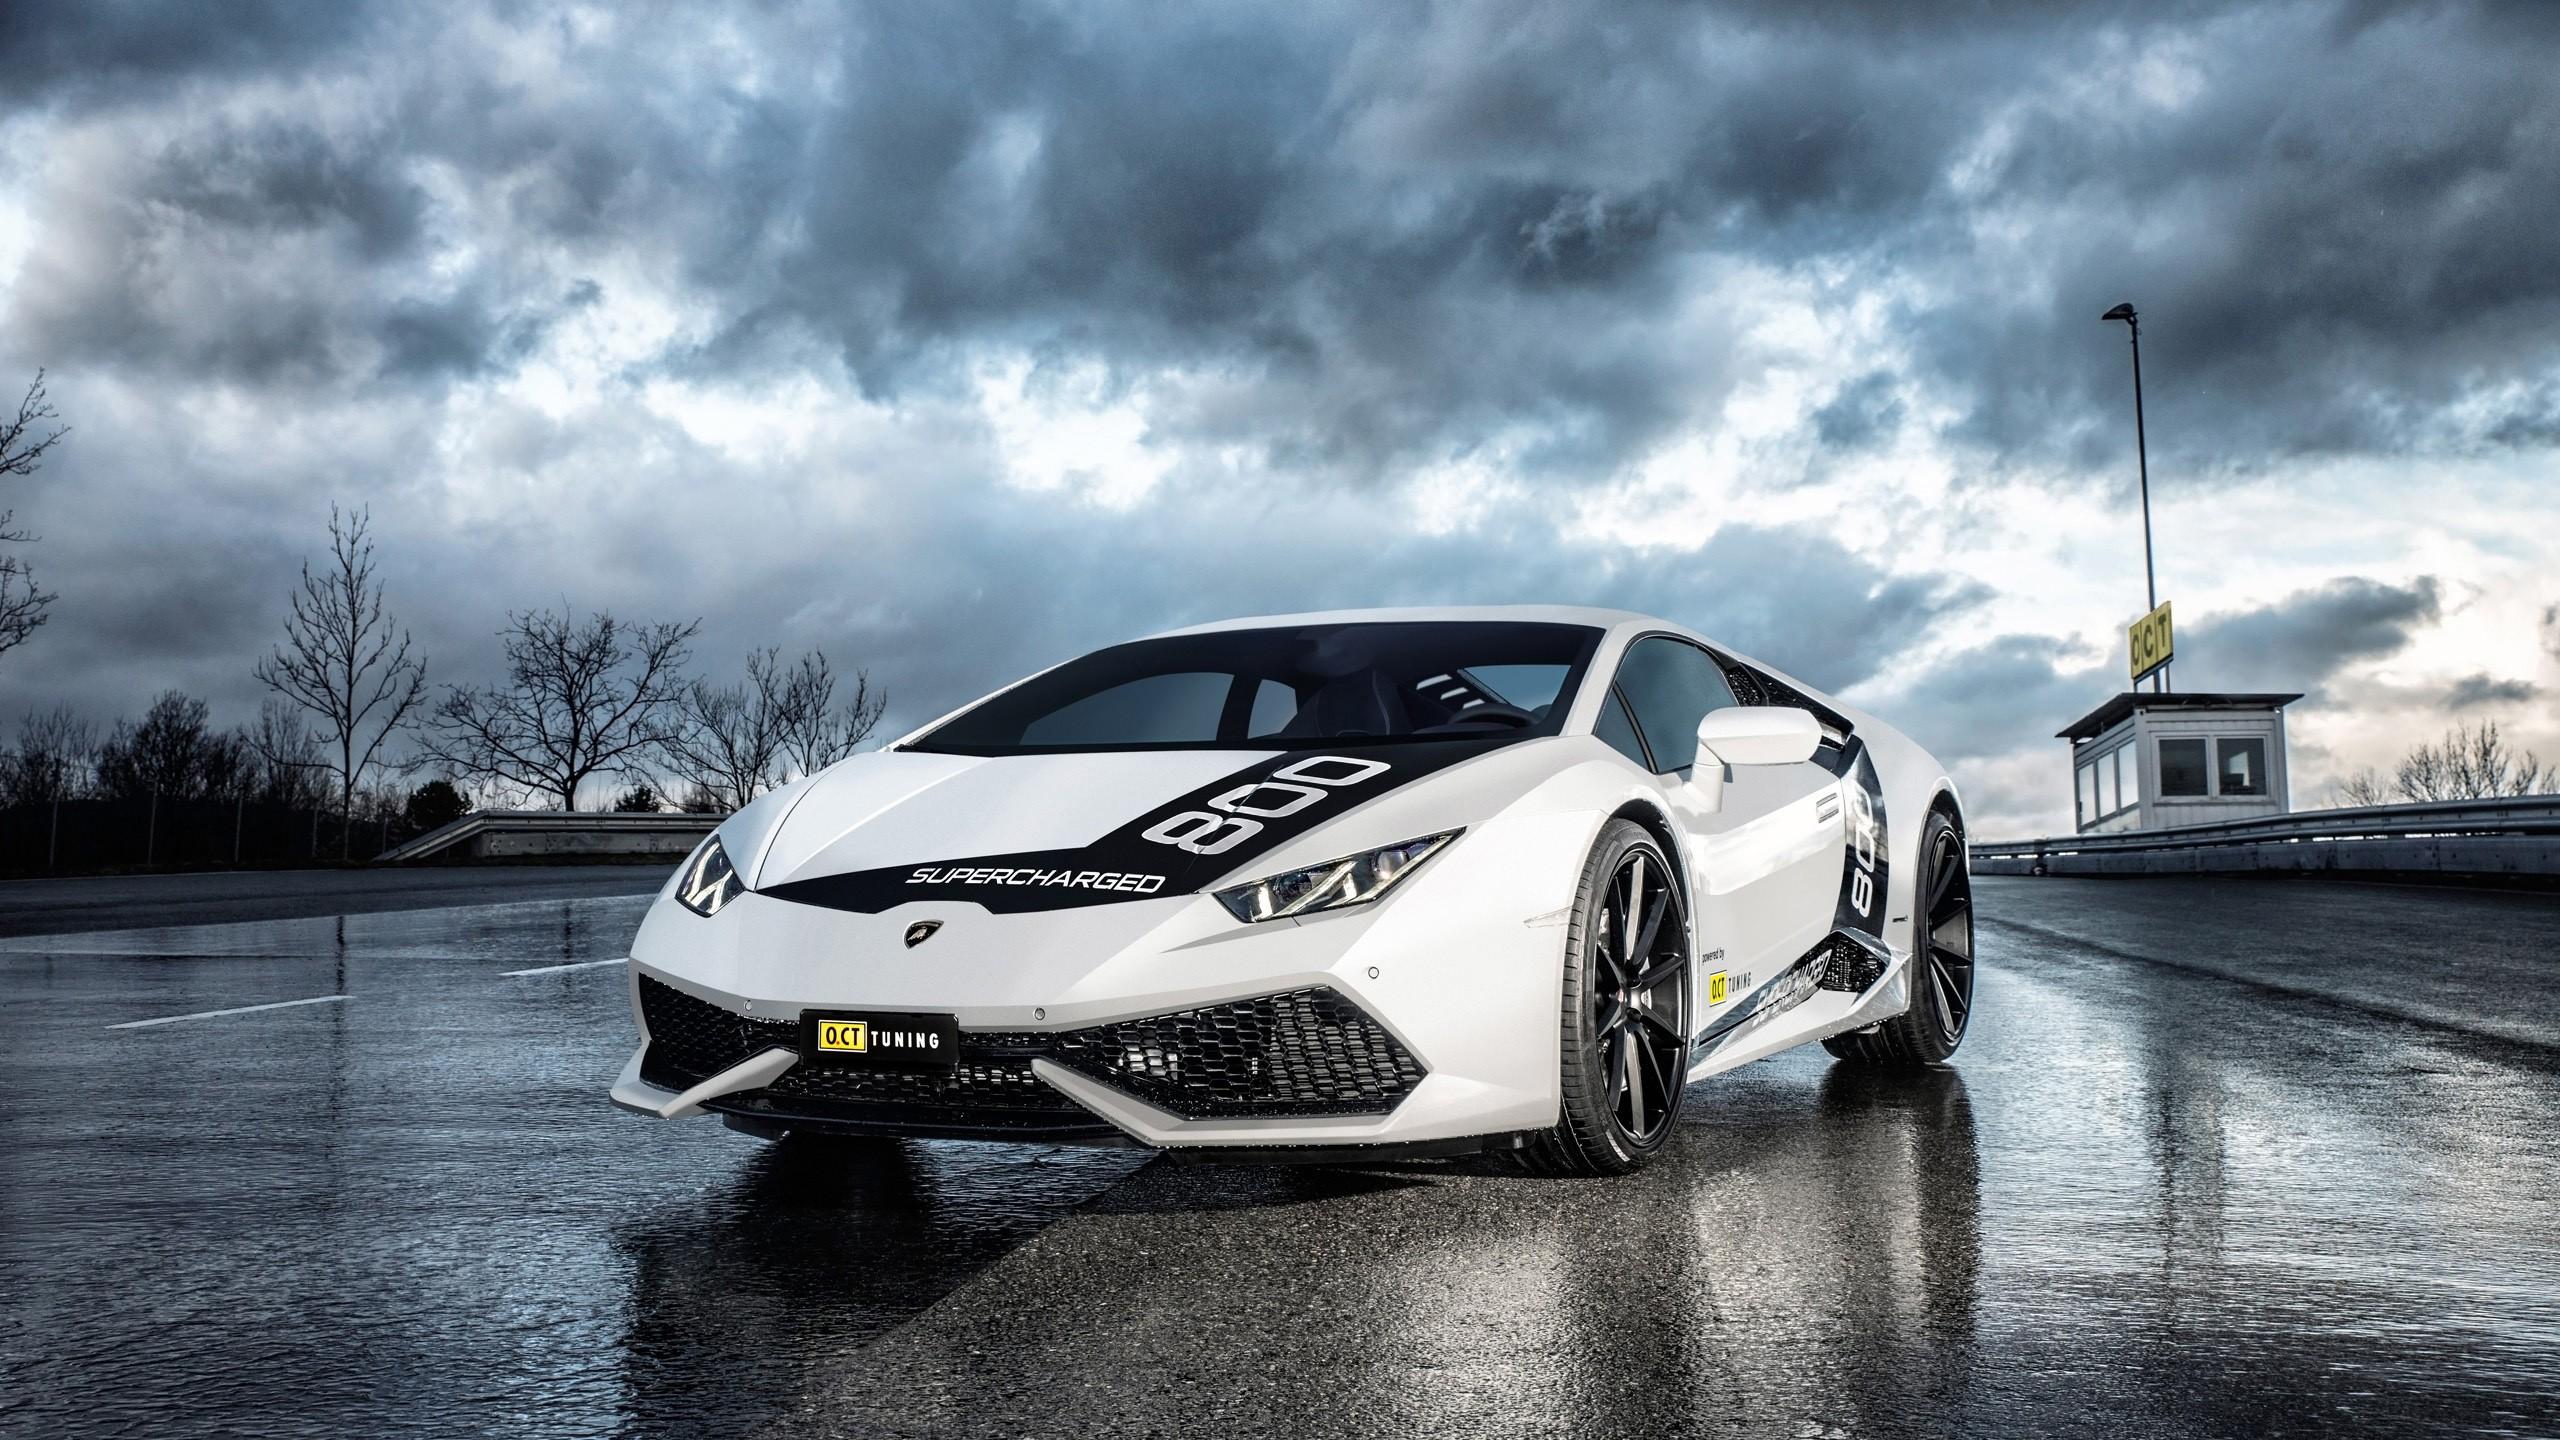 2016 OCT Tuning Lamborghini Huracan O CT800 2 Wallpaper